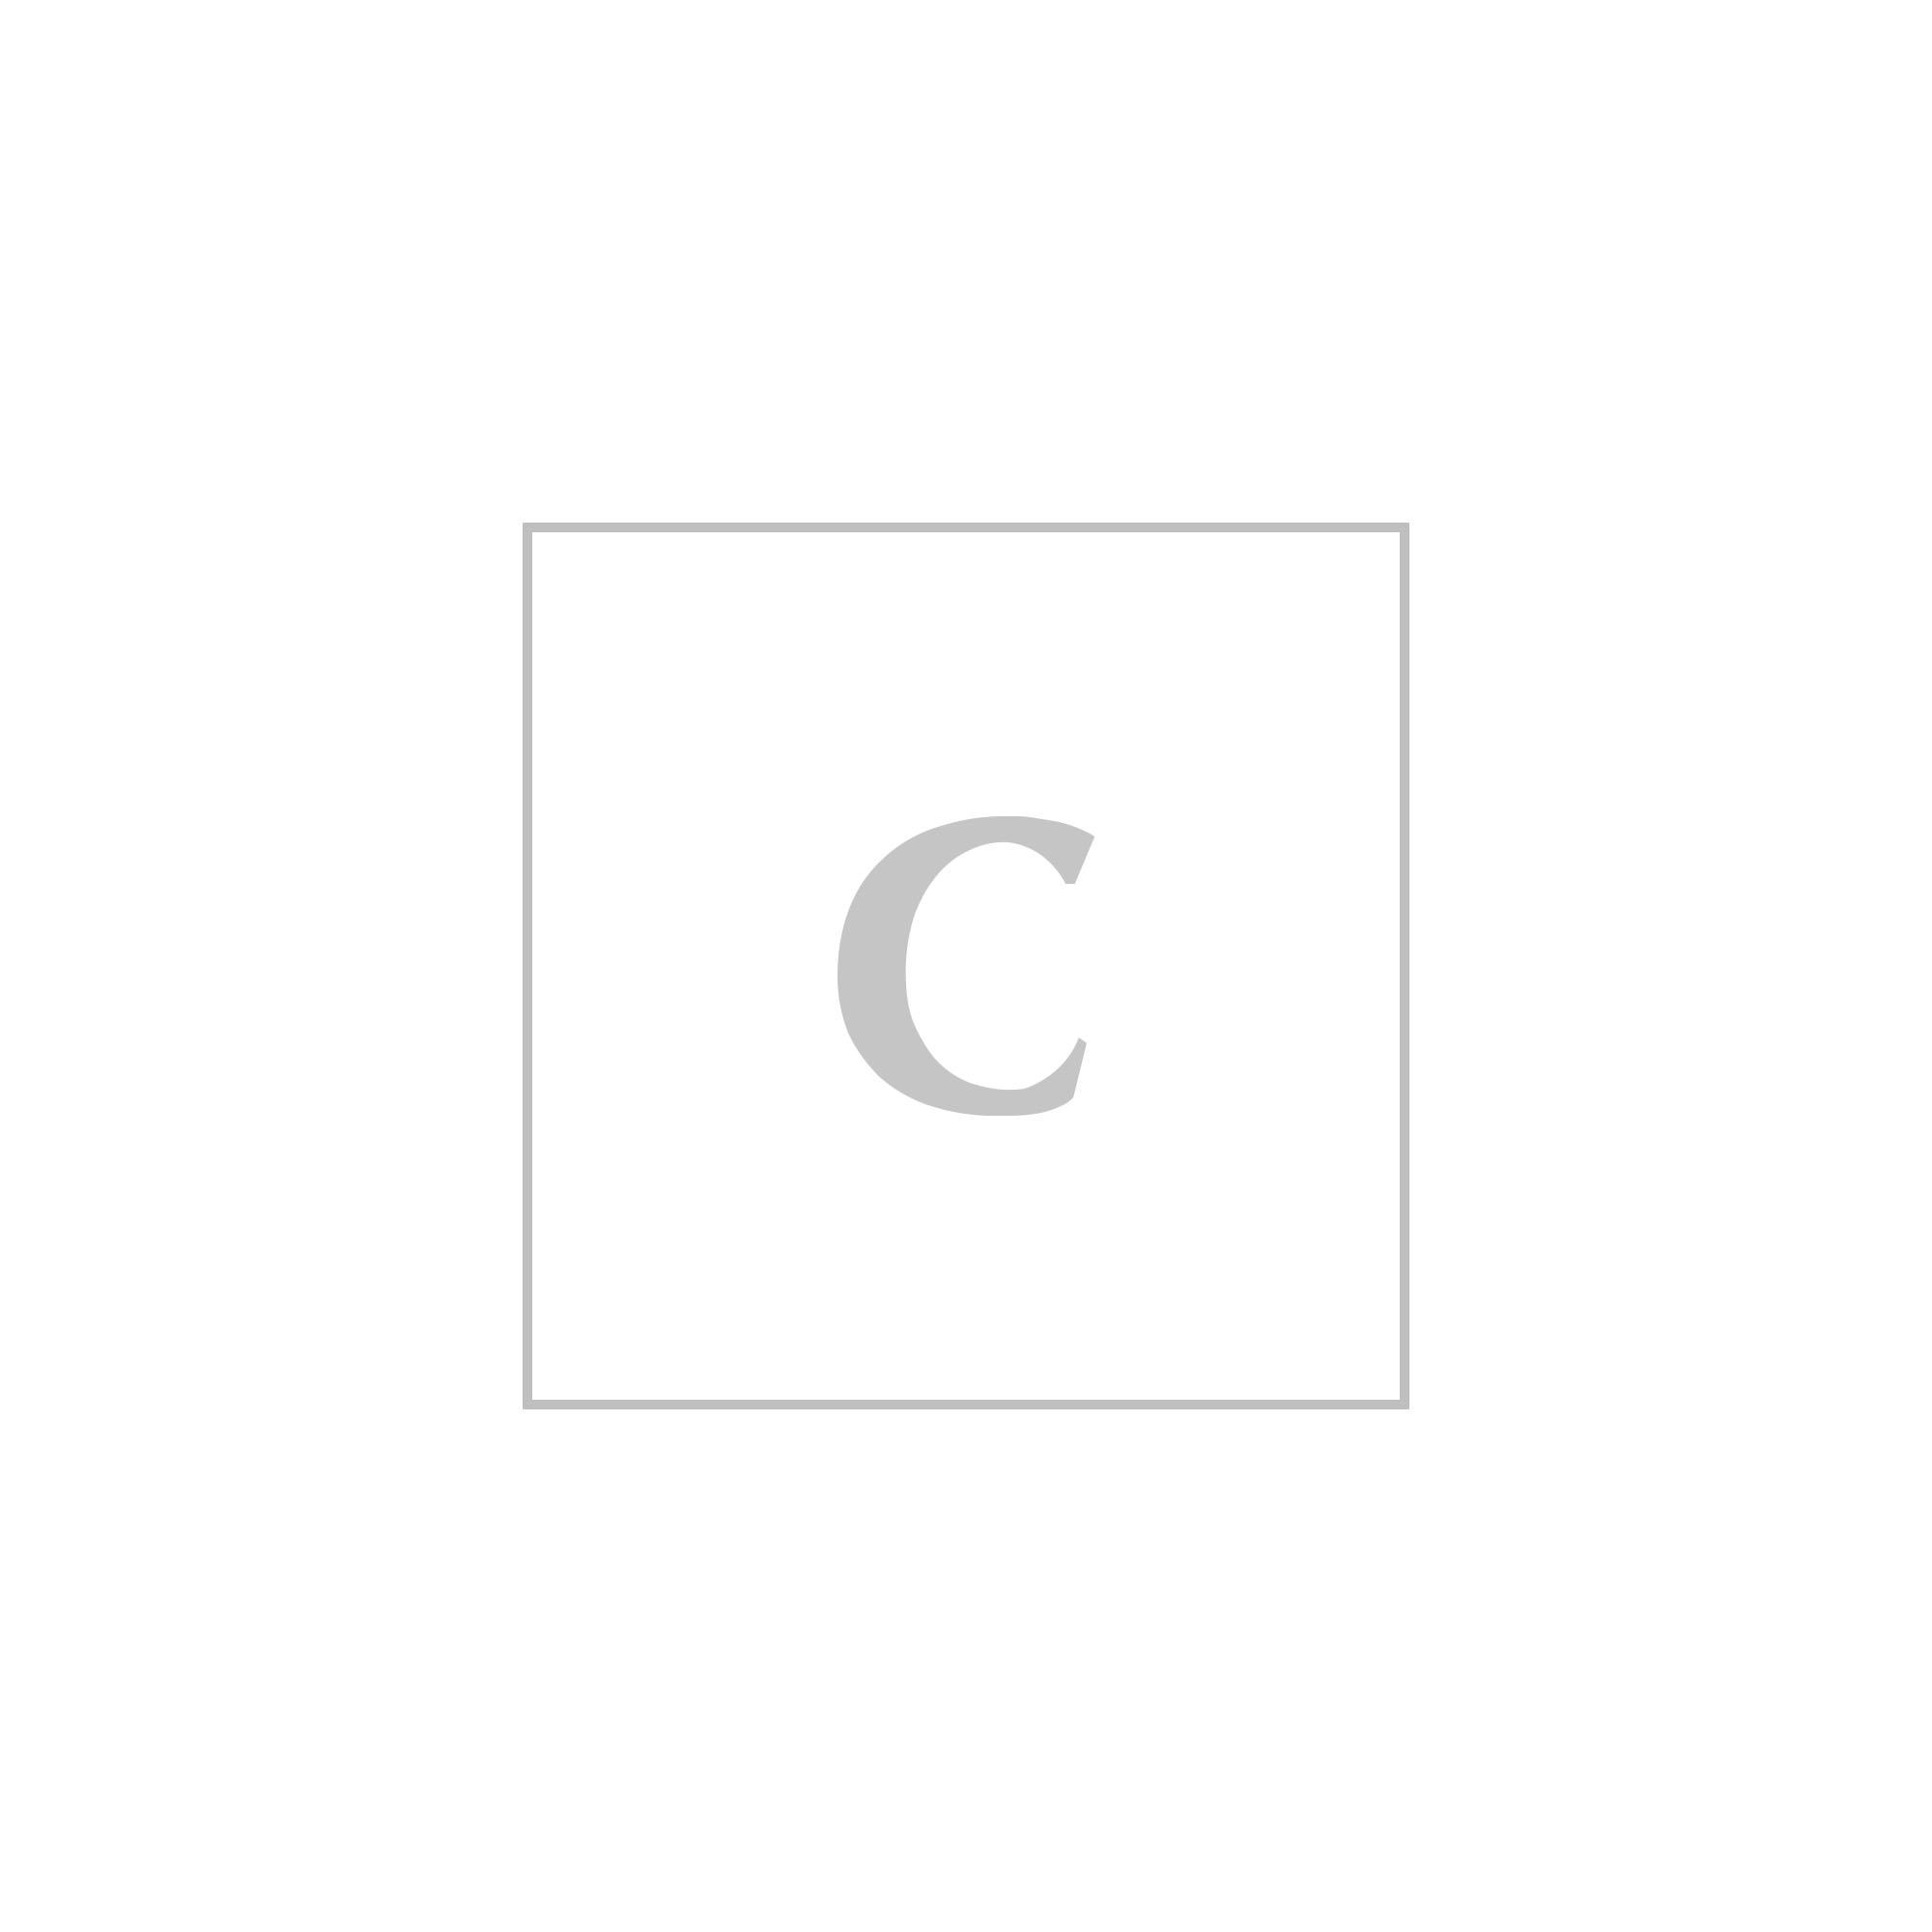 Moncler capsule giubbotto max